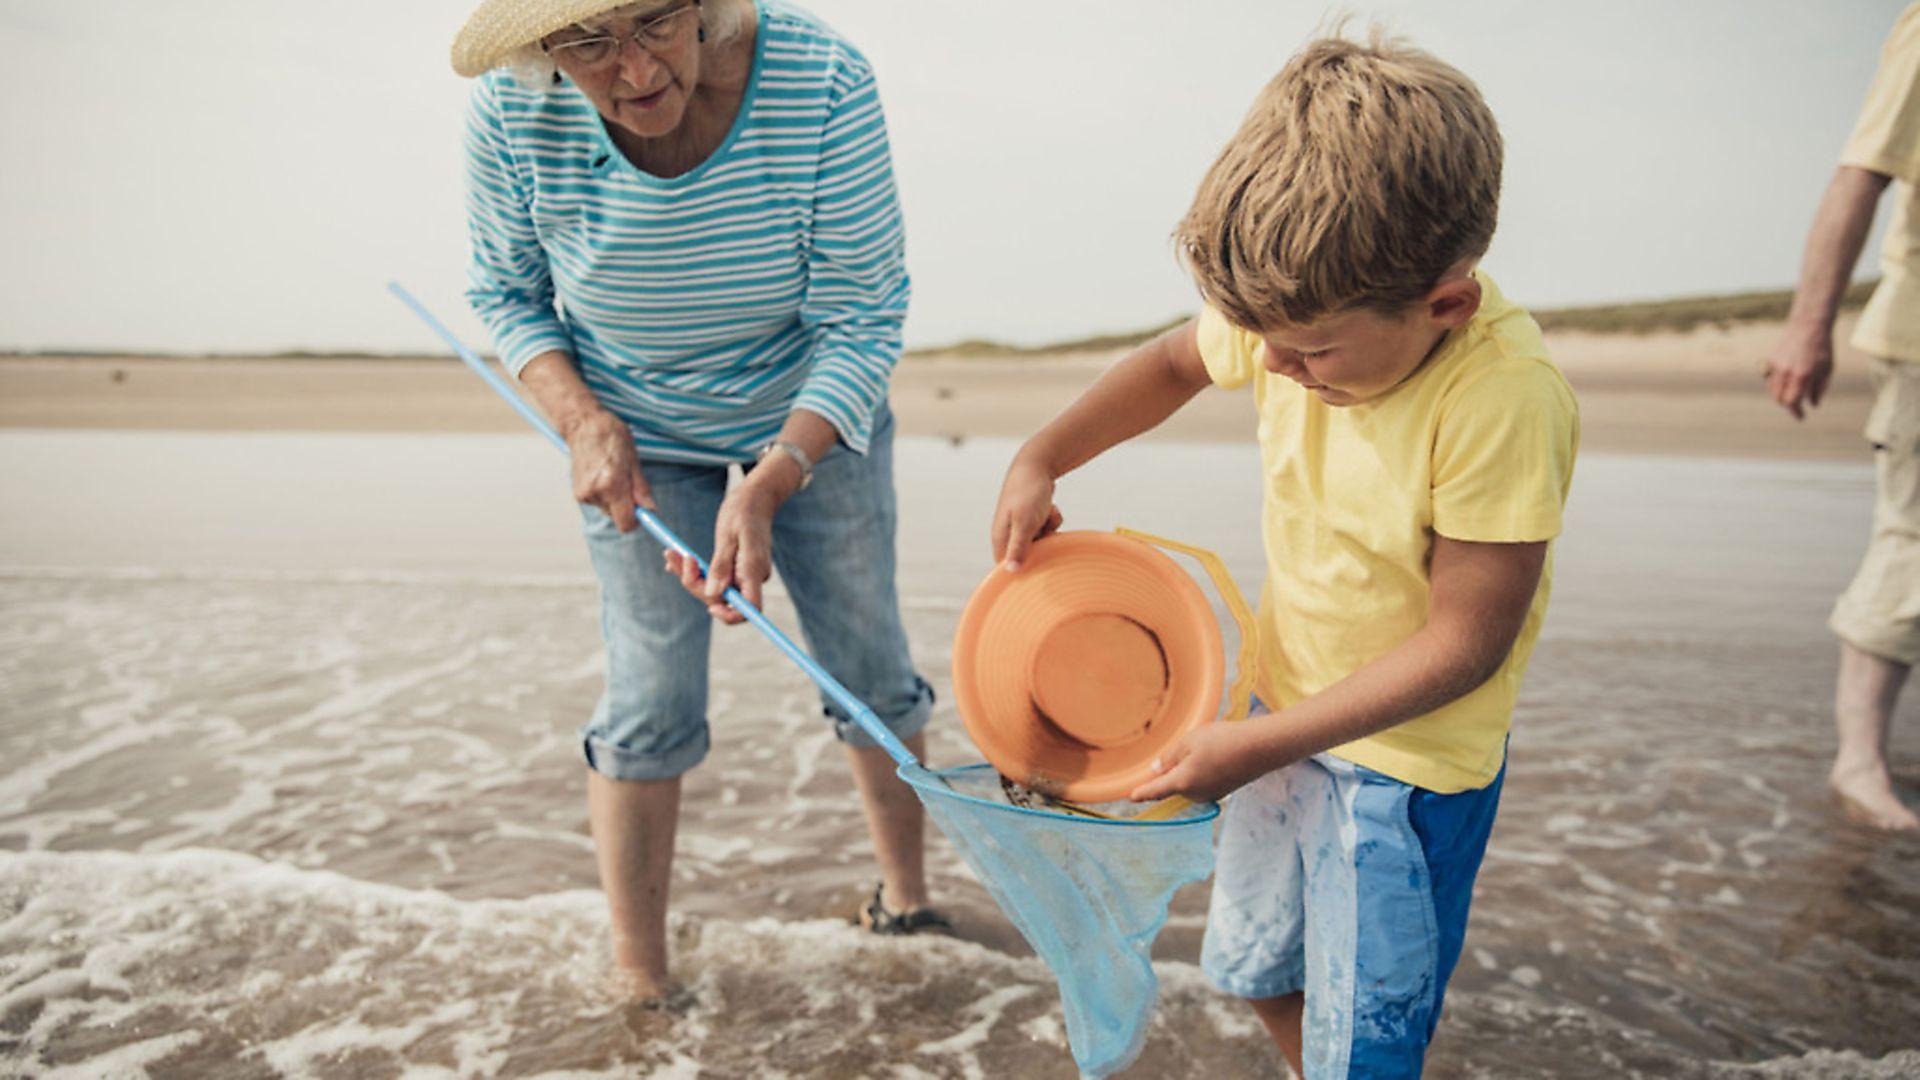 Caring for grandchildren. Picture: PA - Credit: PA